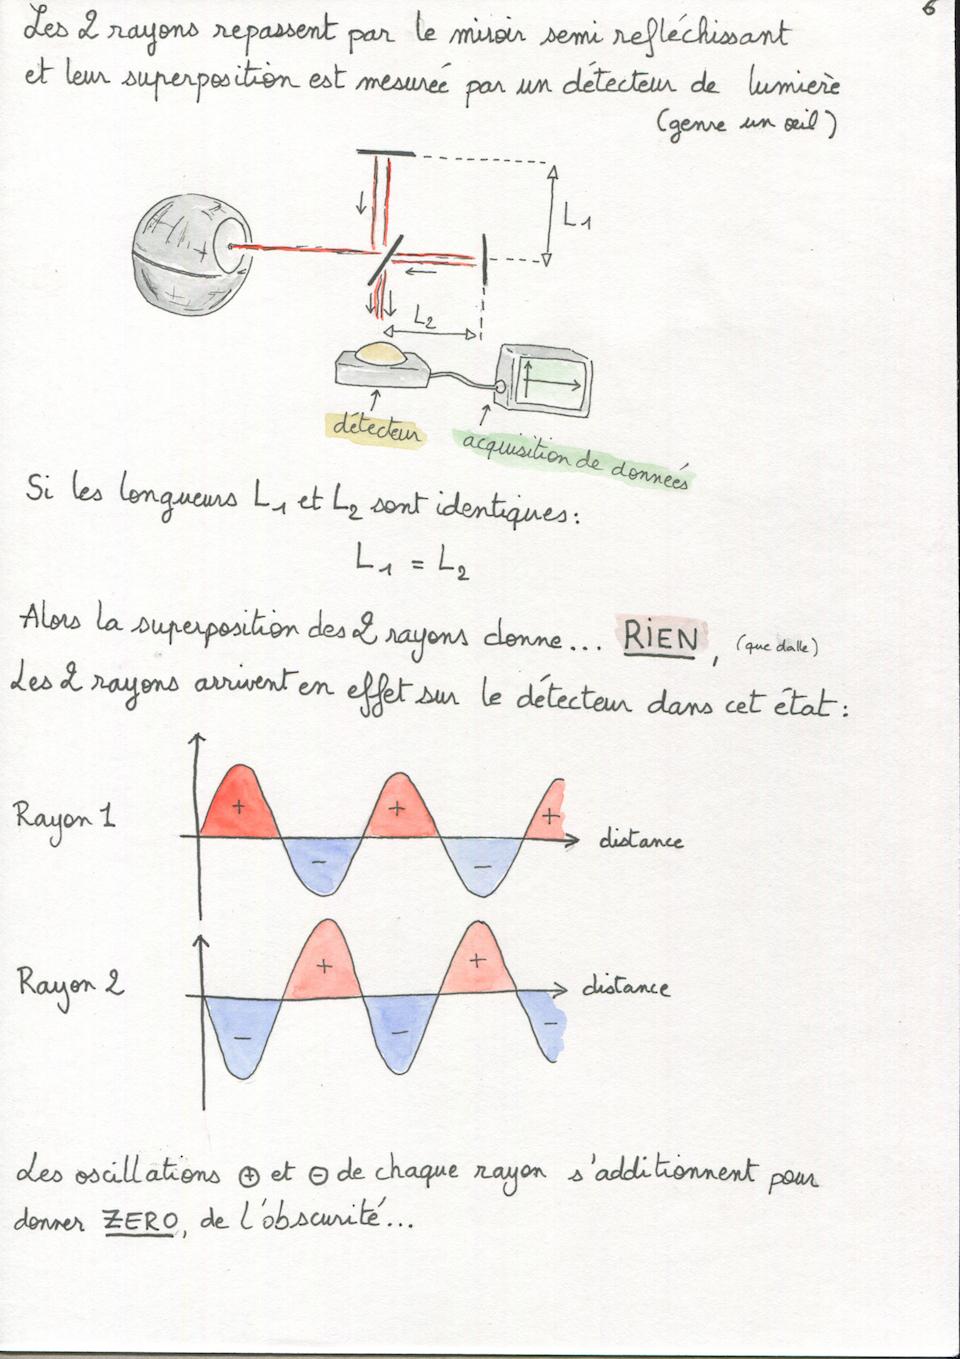 ondes gravitationnelles logo